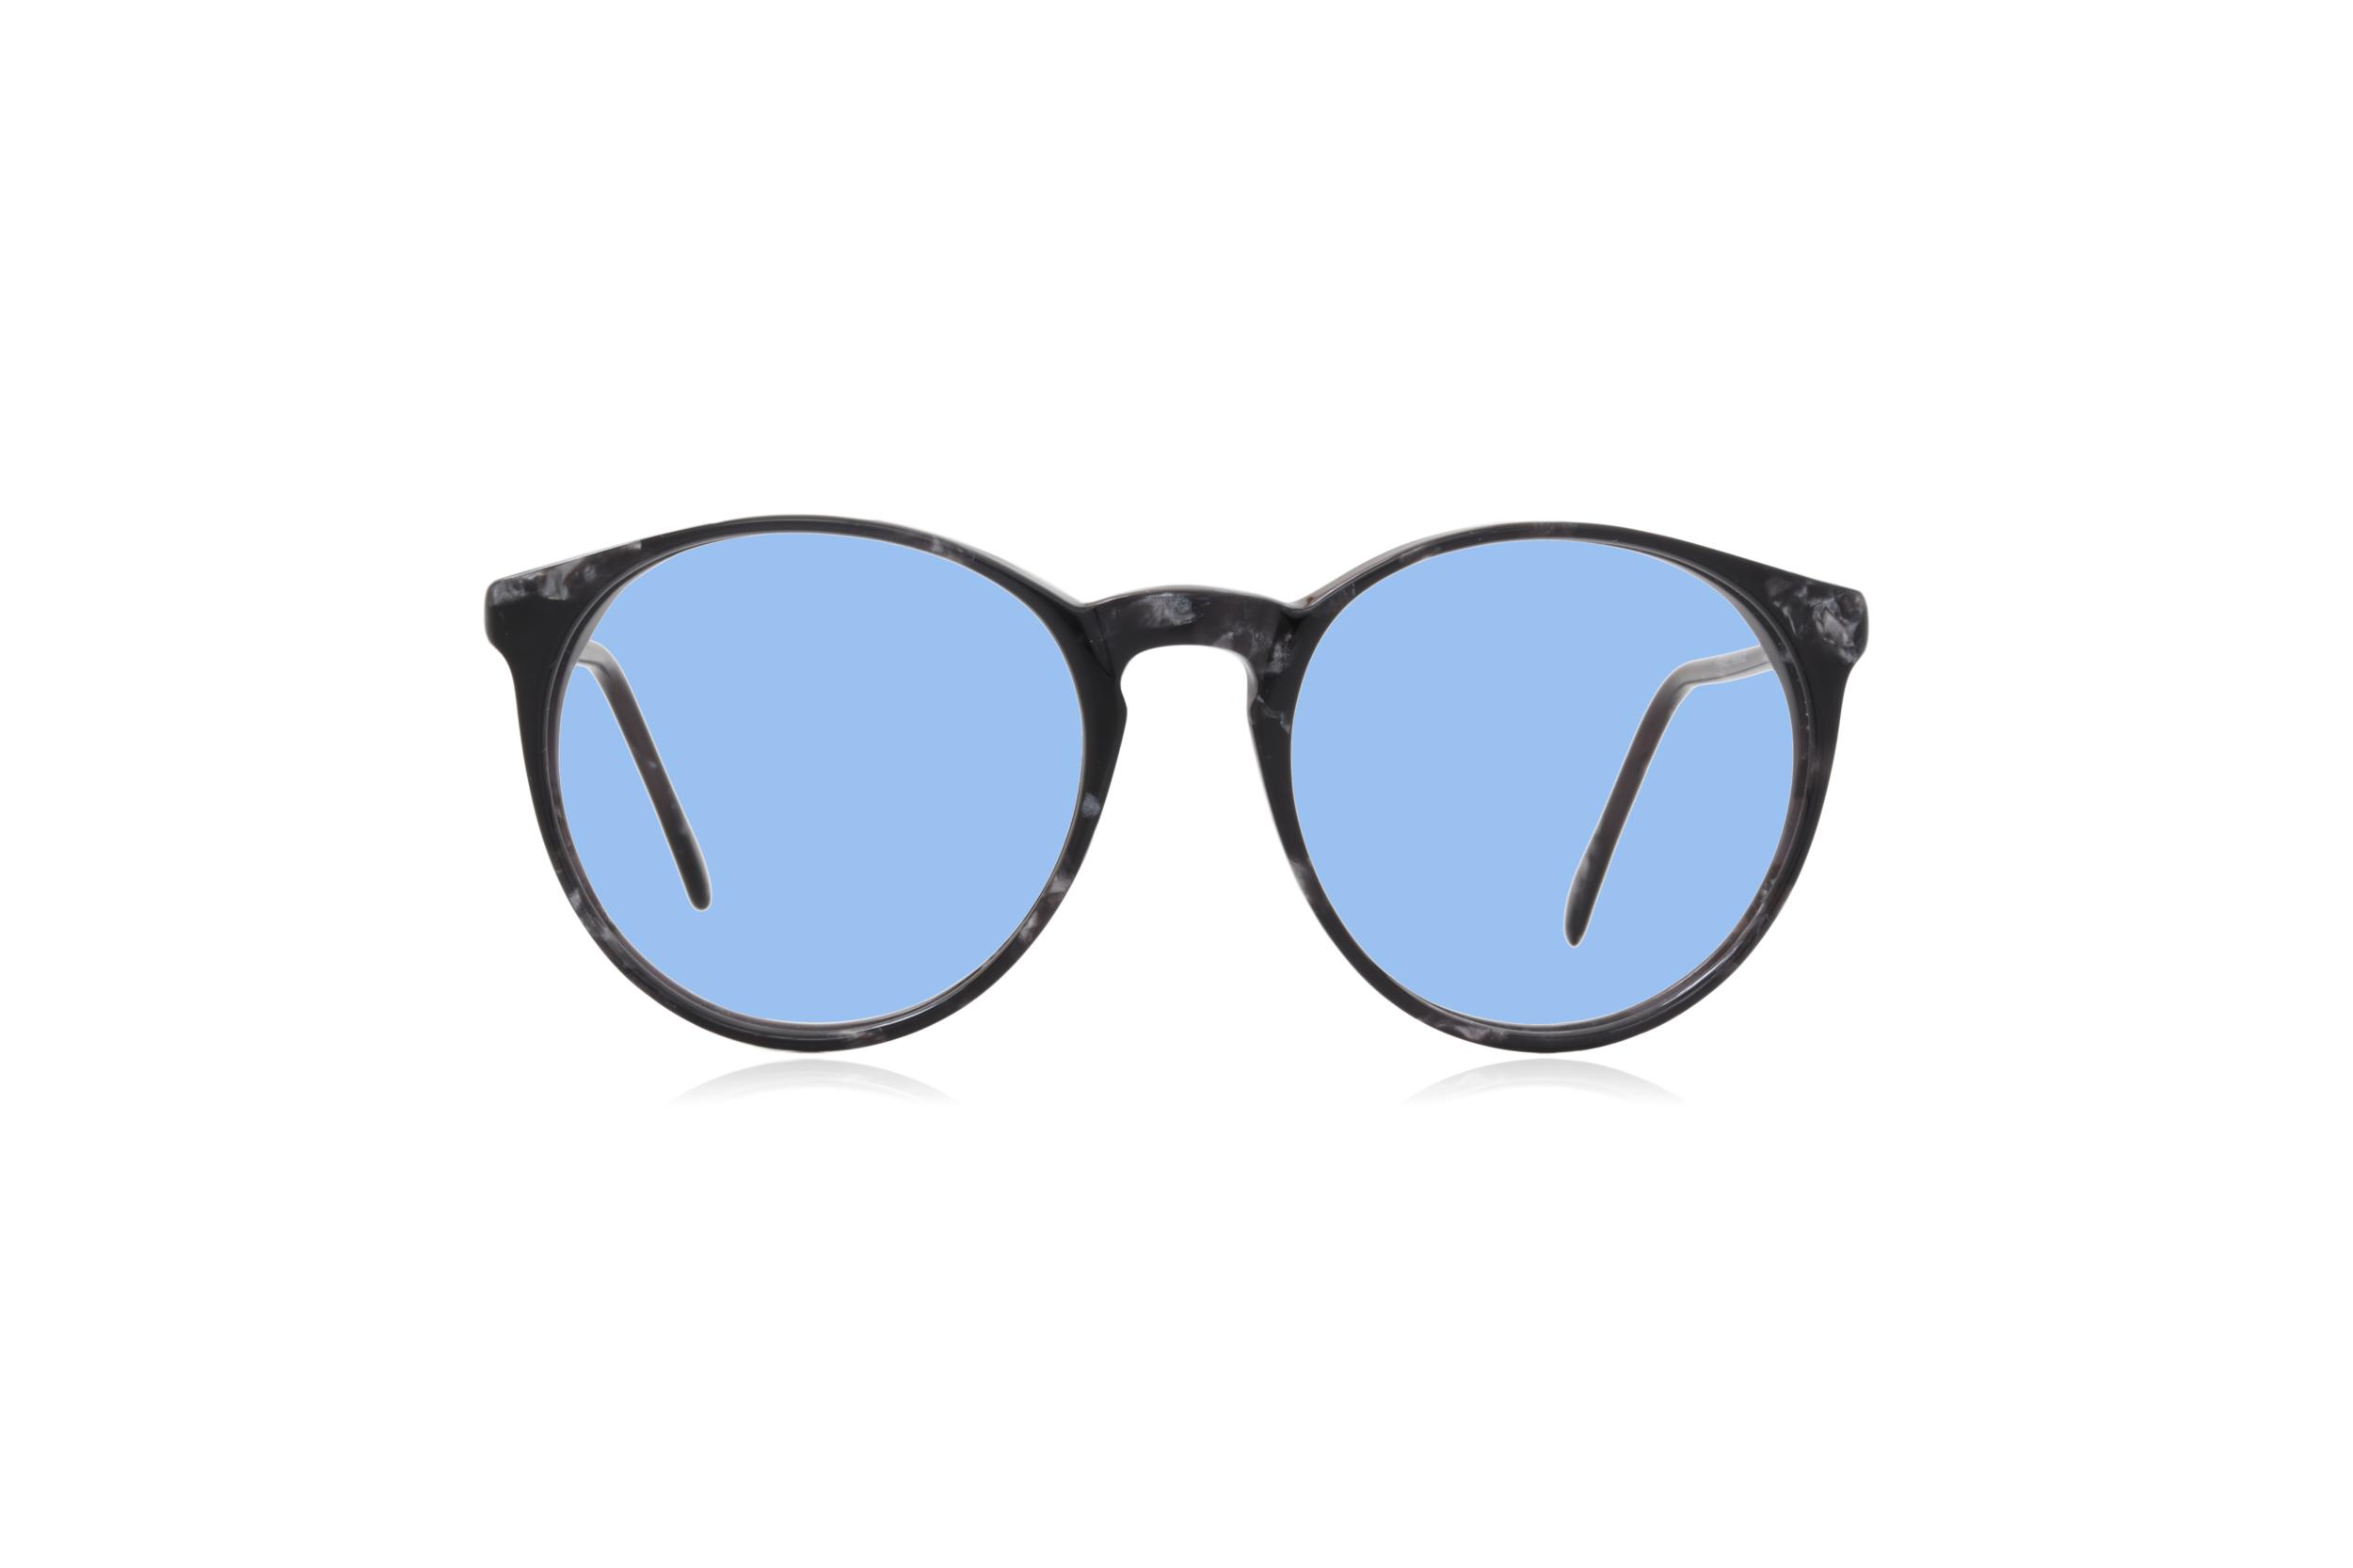 Peep Eyewear, Vintage Glasses, Morel 2730, Round, 80s, Blue.png